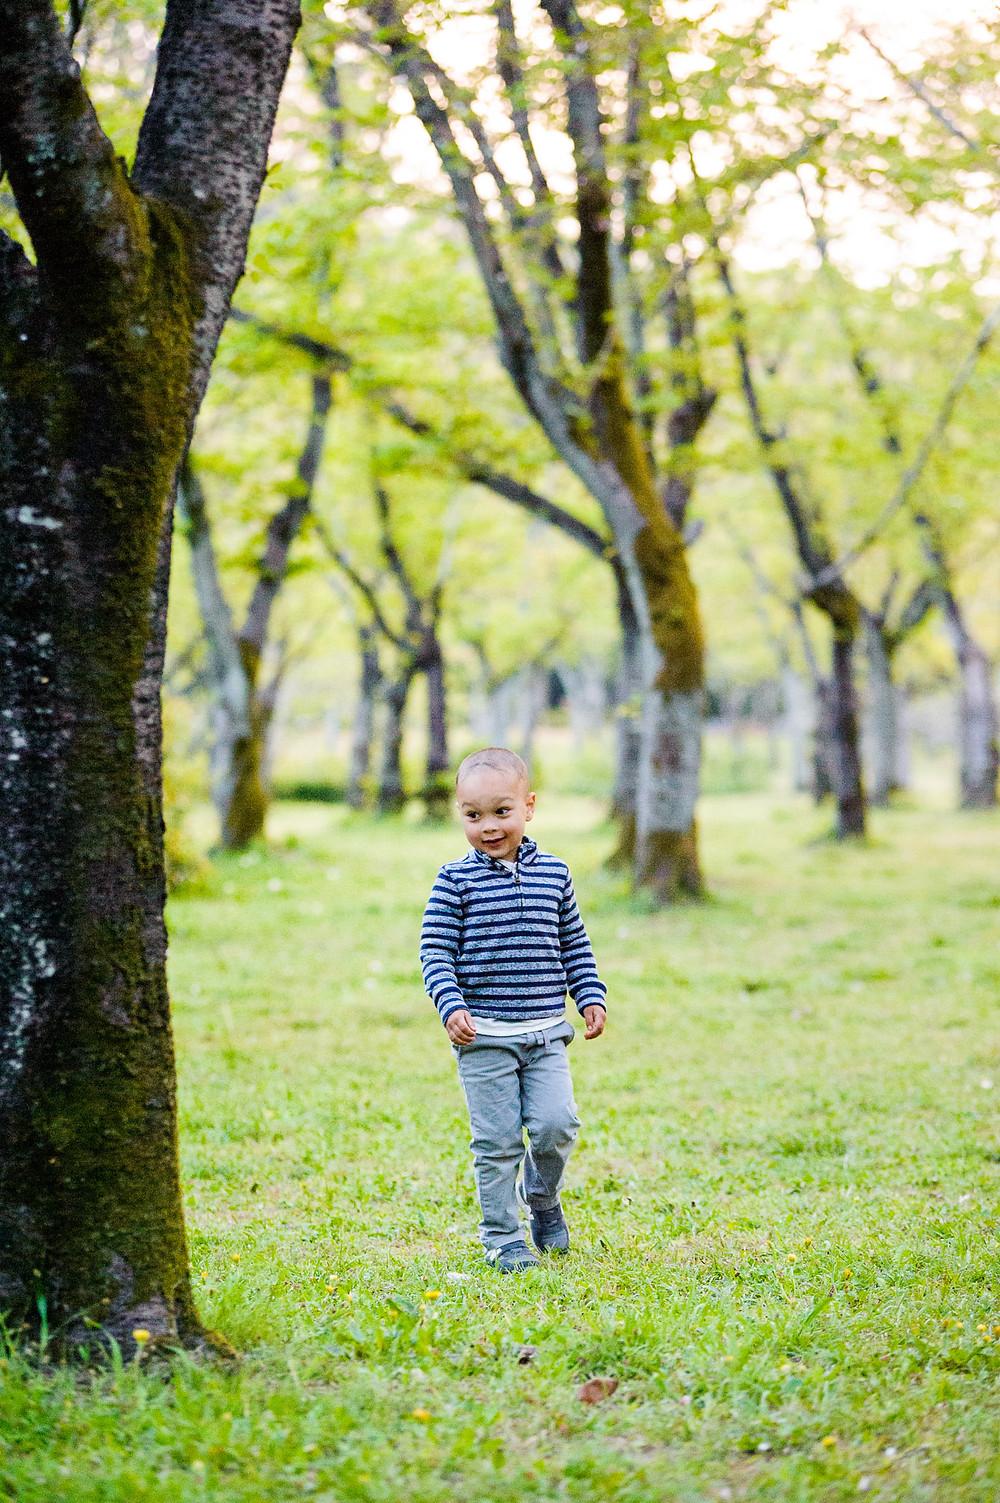 Braxton walks through the trees